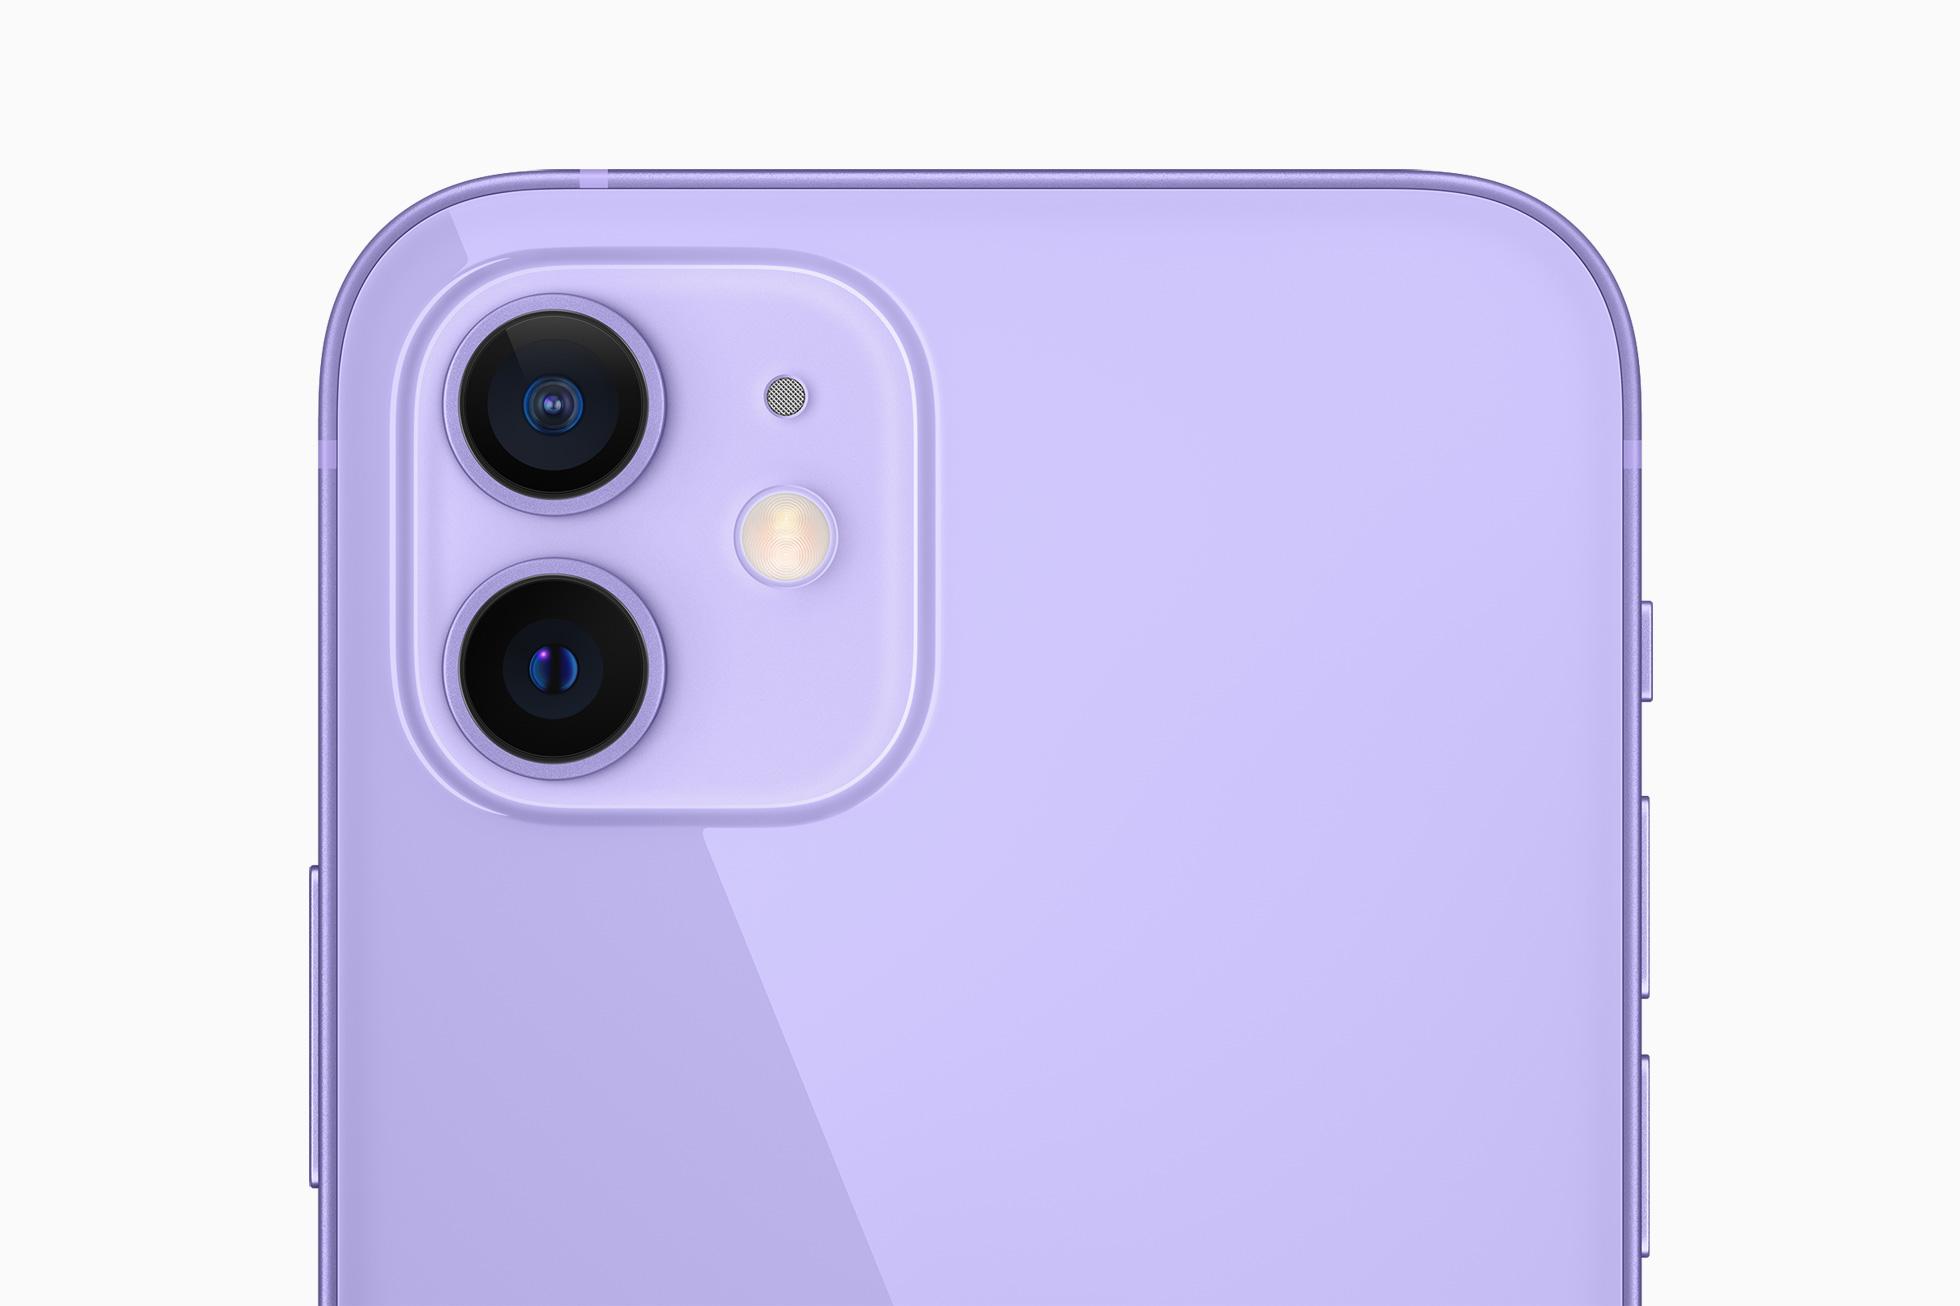 apple iphone-12-spring21 camera 04202021 big.jpg.large 2x